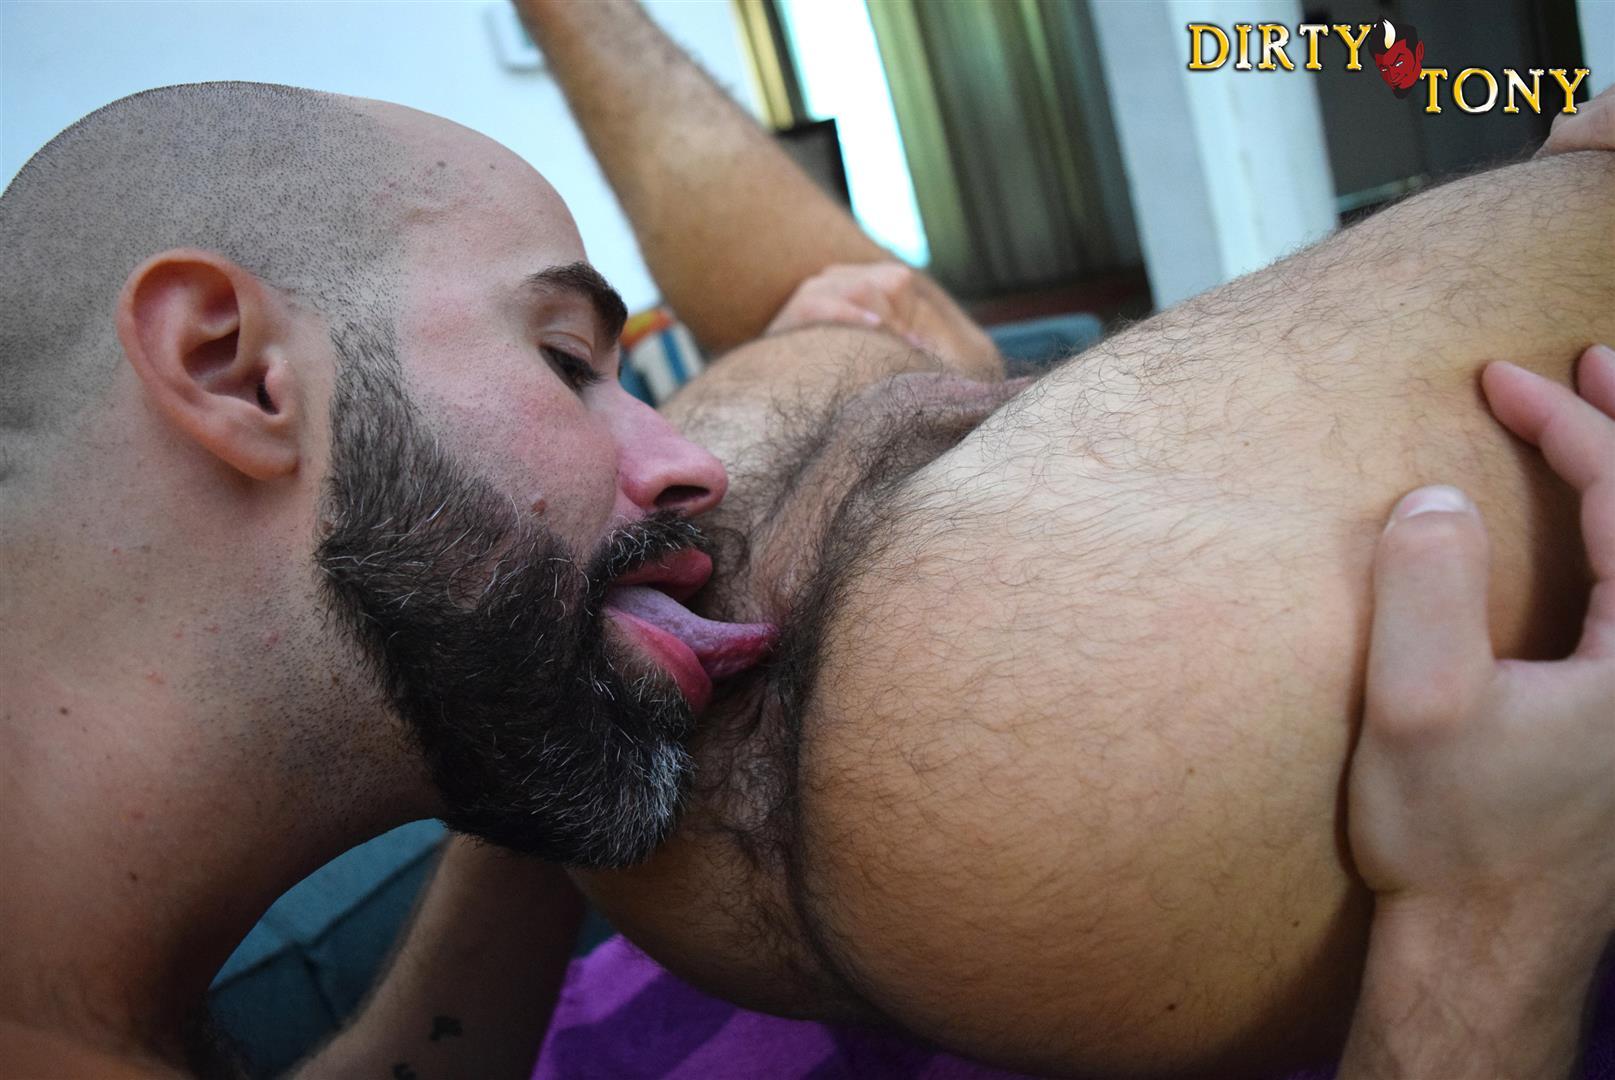 Dirty-Tony-Damon-Andros-and-Aarin-Asker-Bareback-Sex-Video-Amateur-Gay-Porn-03 Damon Andros Dominating Sub Aarin Asker Bareback